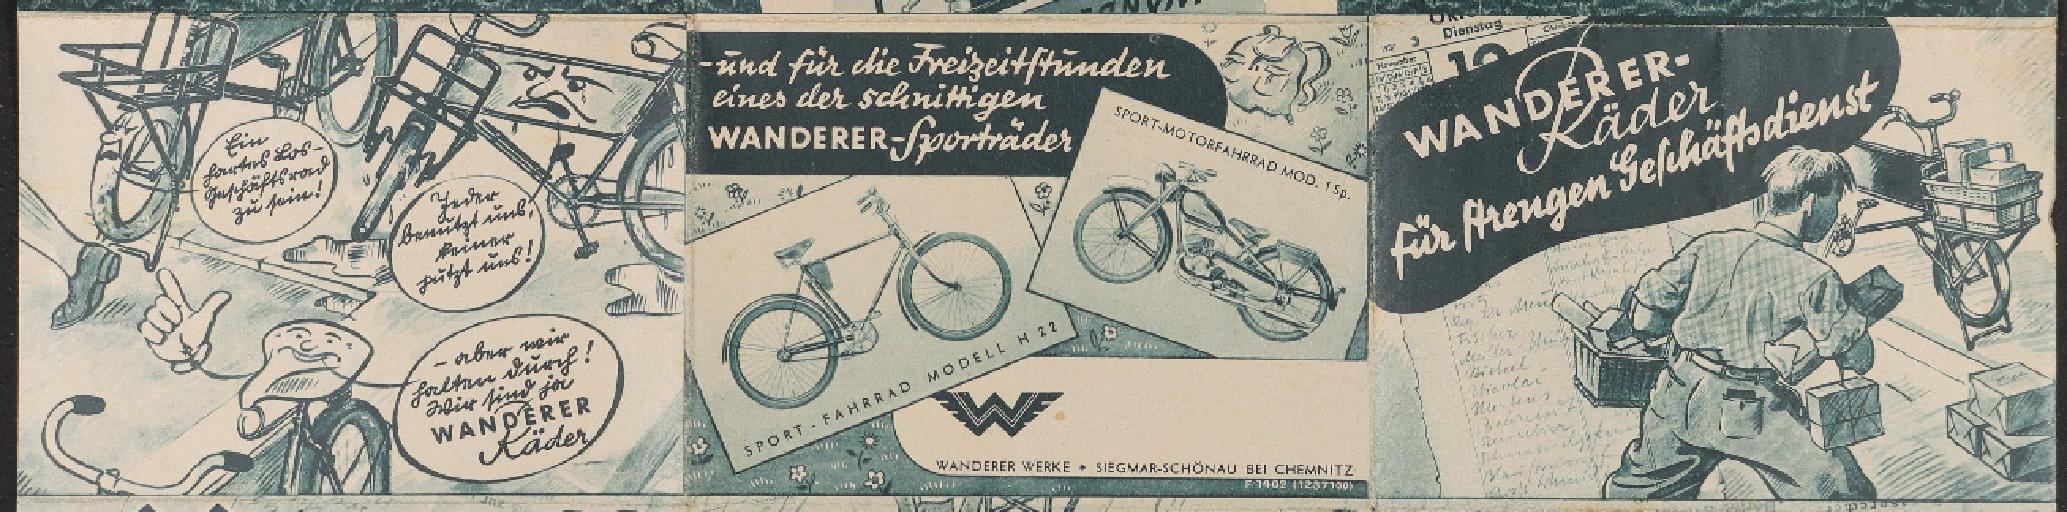 Wanderer Faltblatt 1930er Jahre